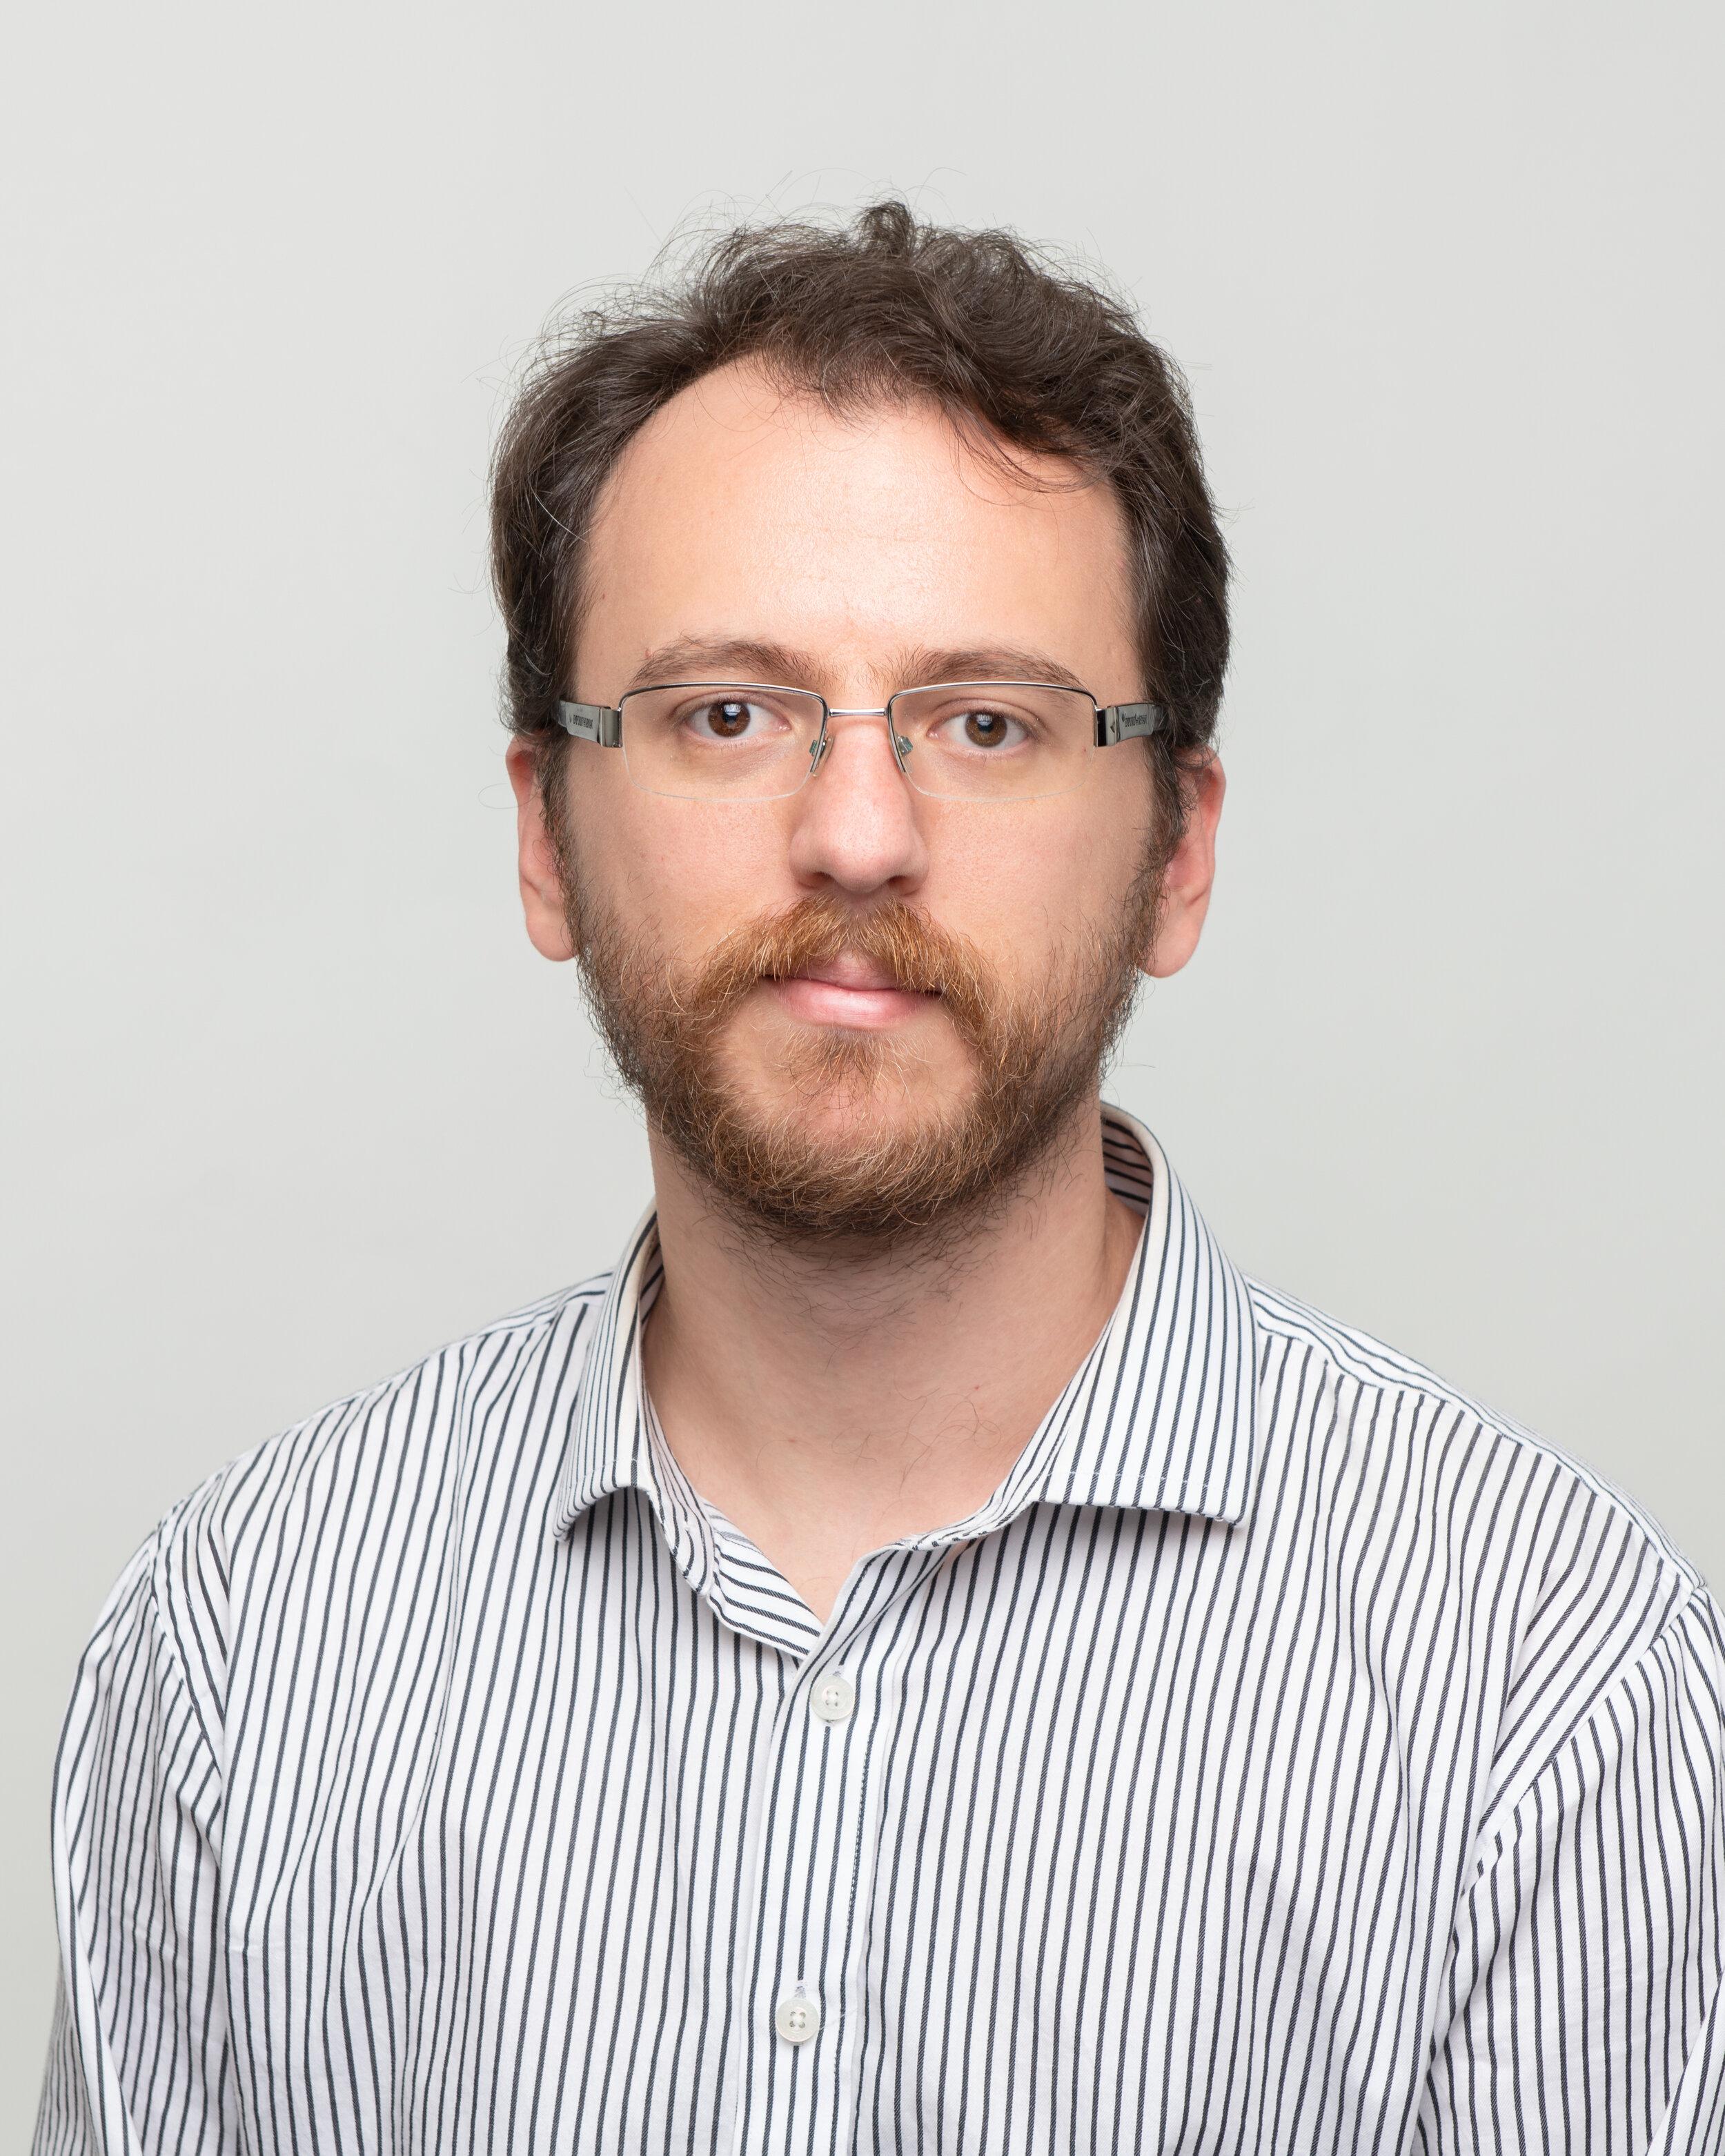 Dr. Andre Fonteles